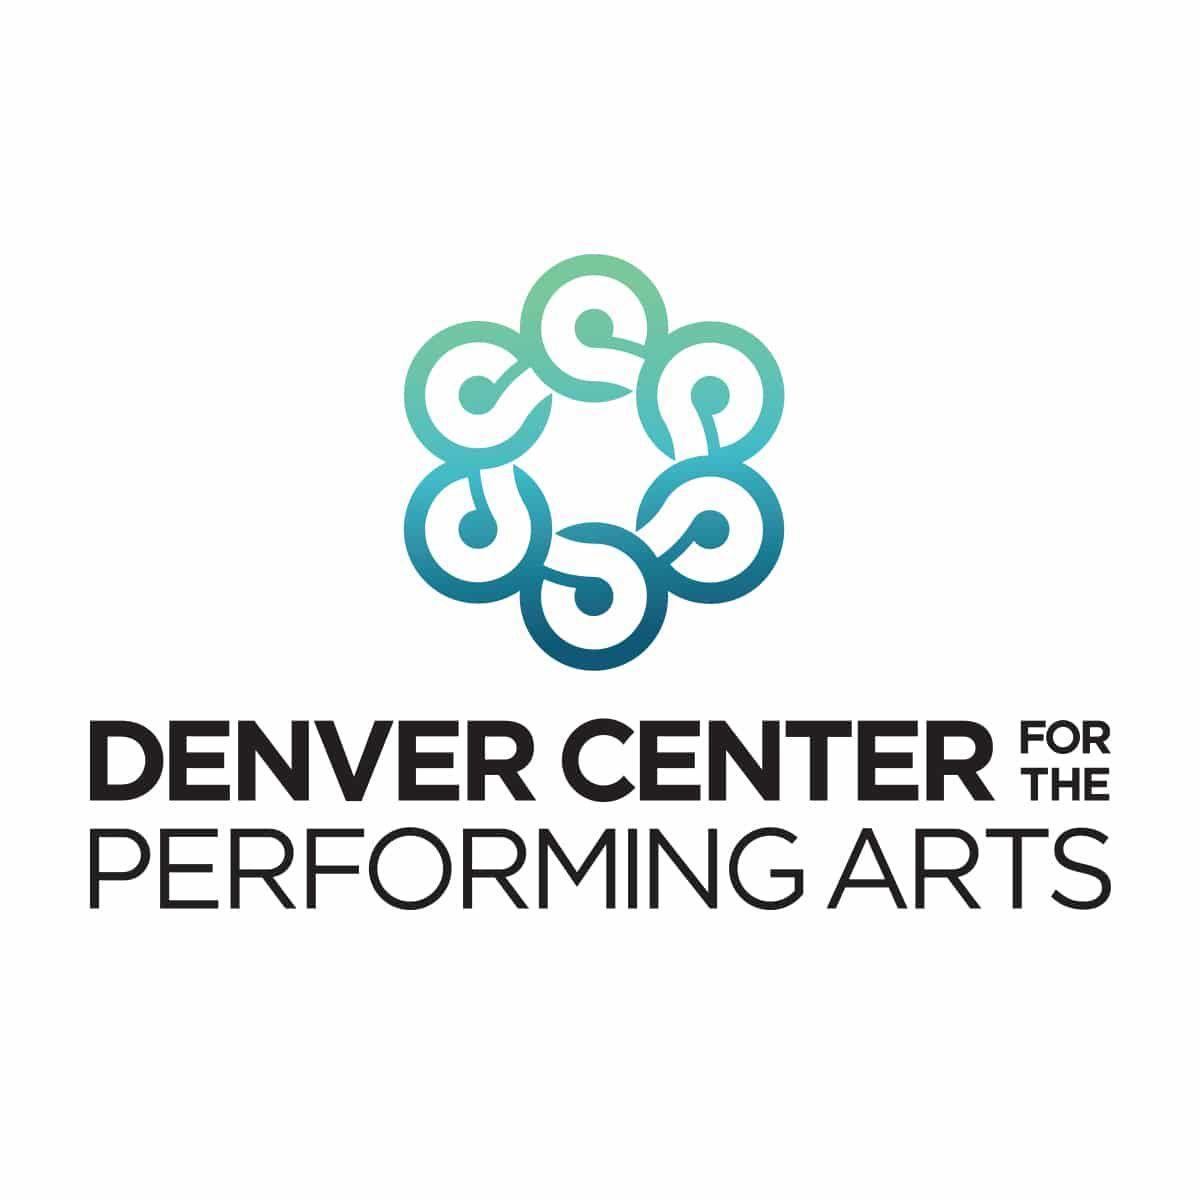 Denver Center for Performing Arts Logo